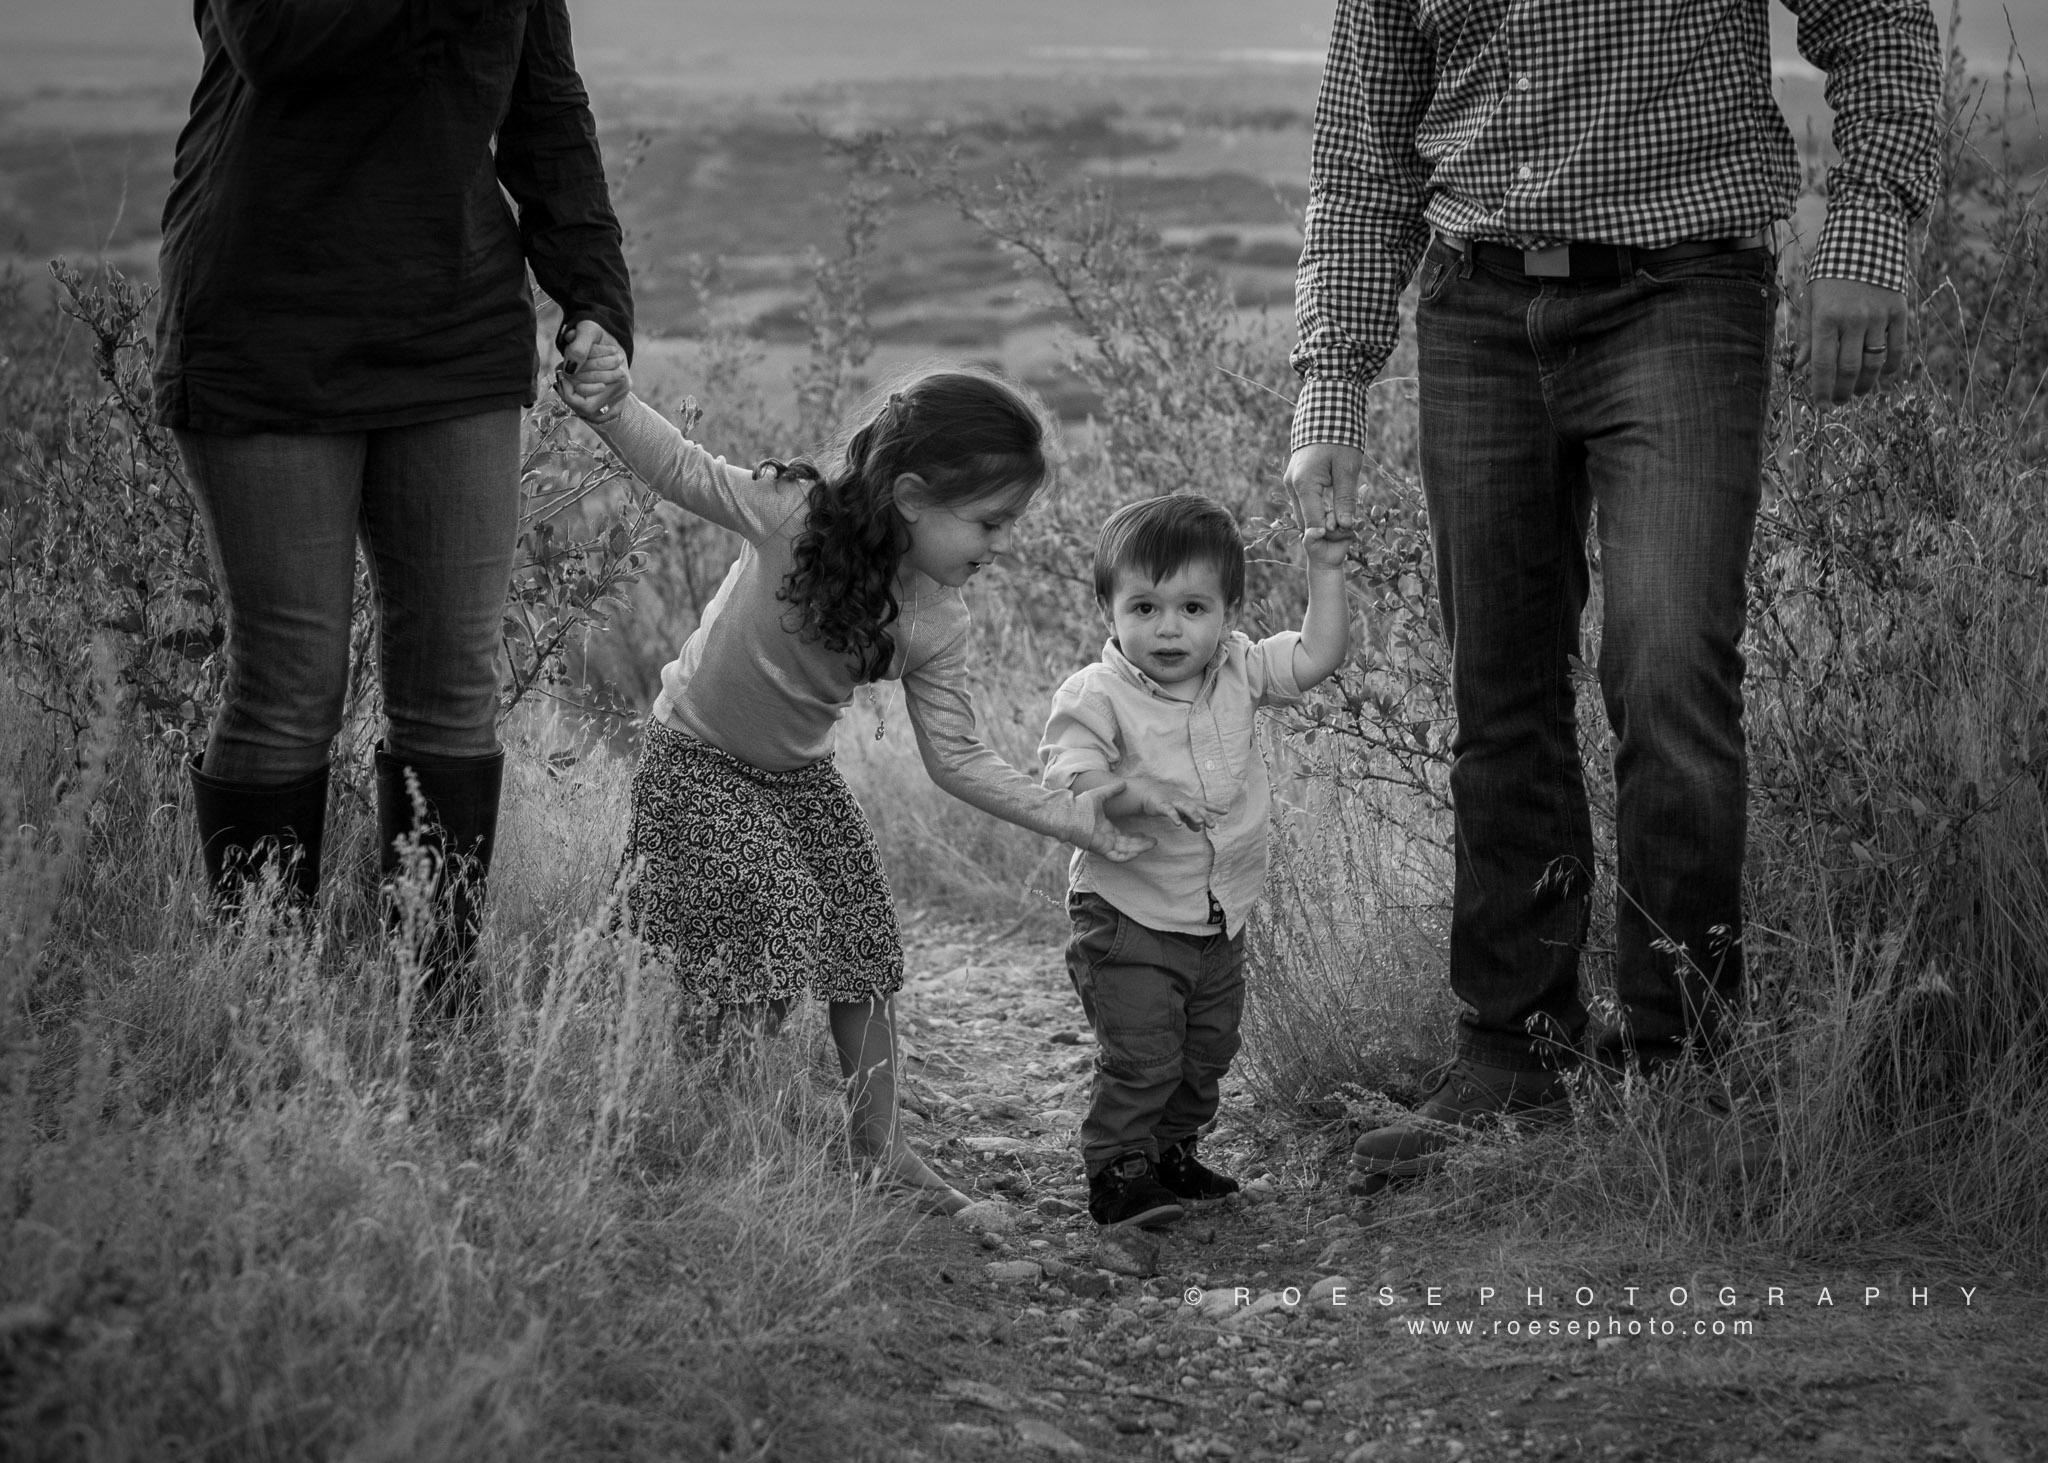 C.-Roese-Ramp-Roese-Photography-LLC.-Bennett-Family-24.jpg